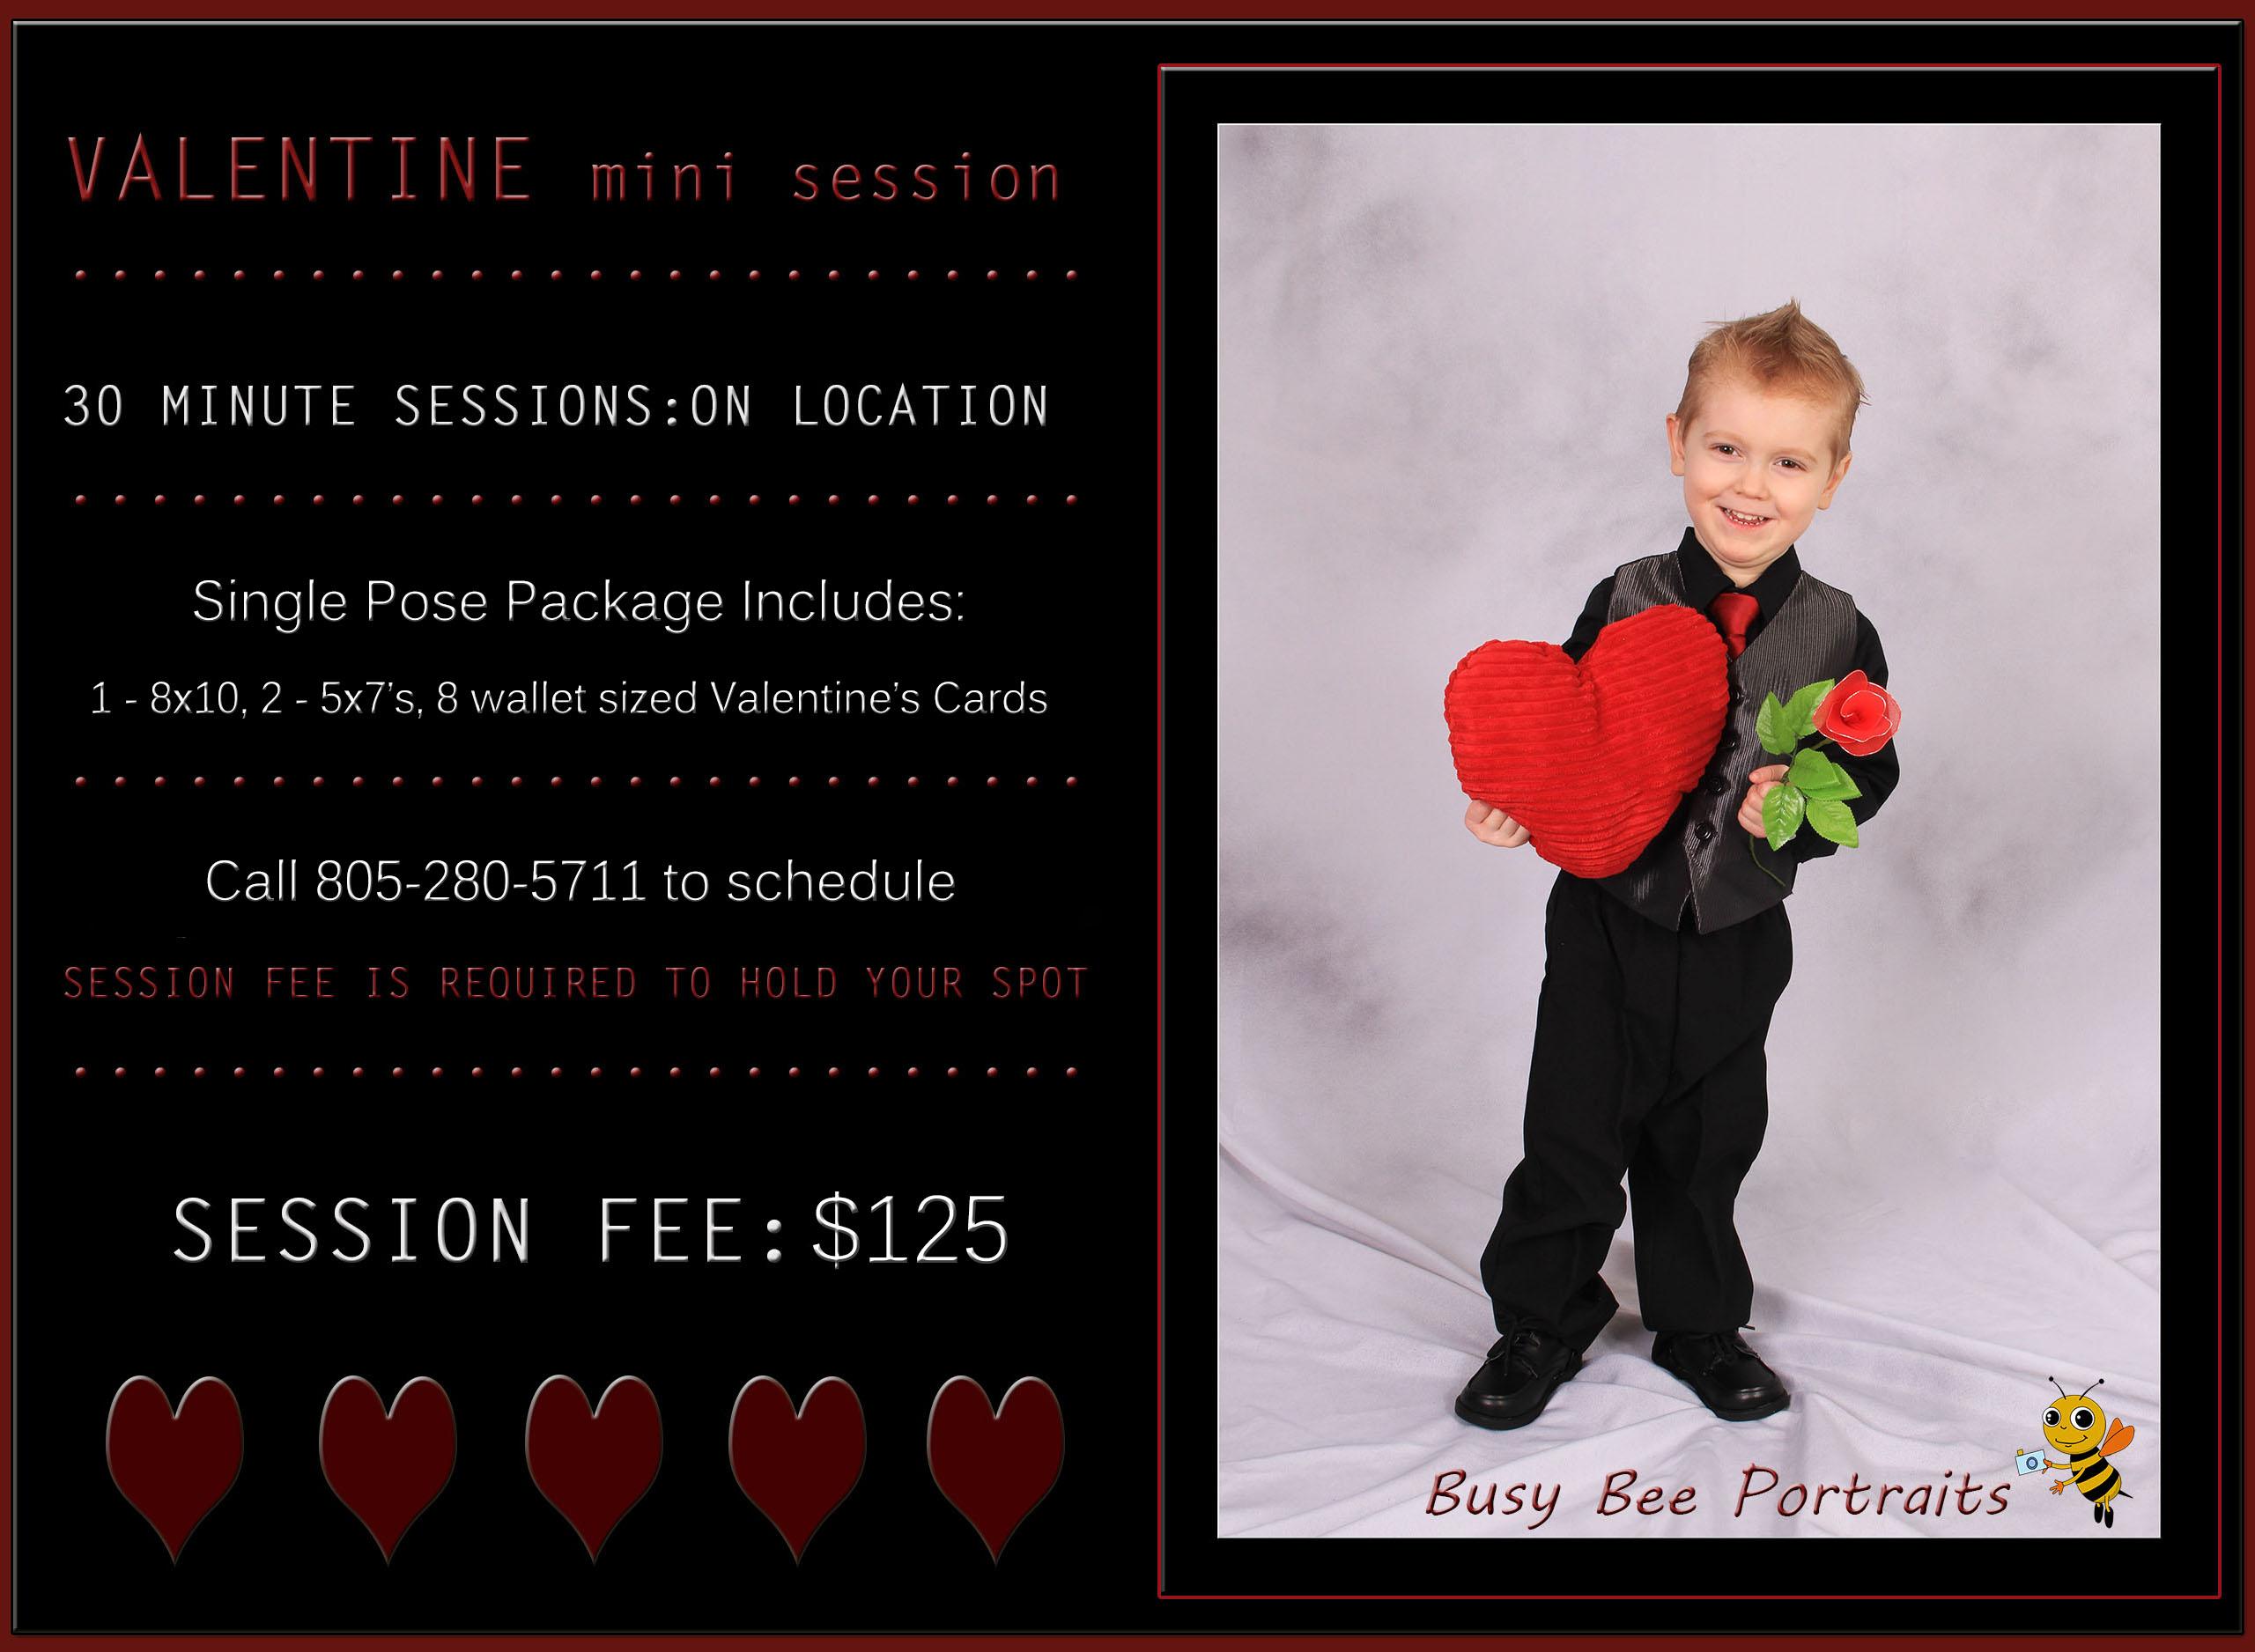 Valentine's Day Mini Session by Busy Bee Portraits, Santa Barbara Children's Photographer, Family photographer in Santa Barbara